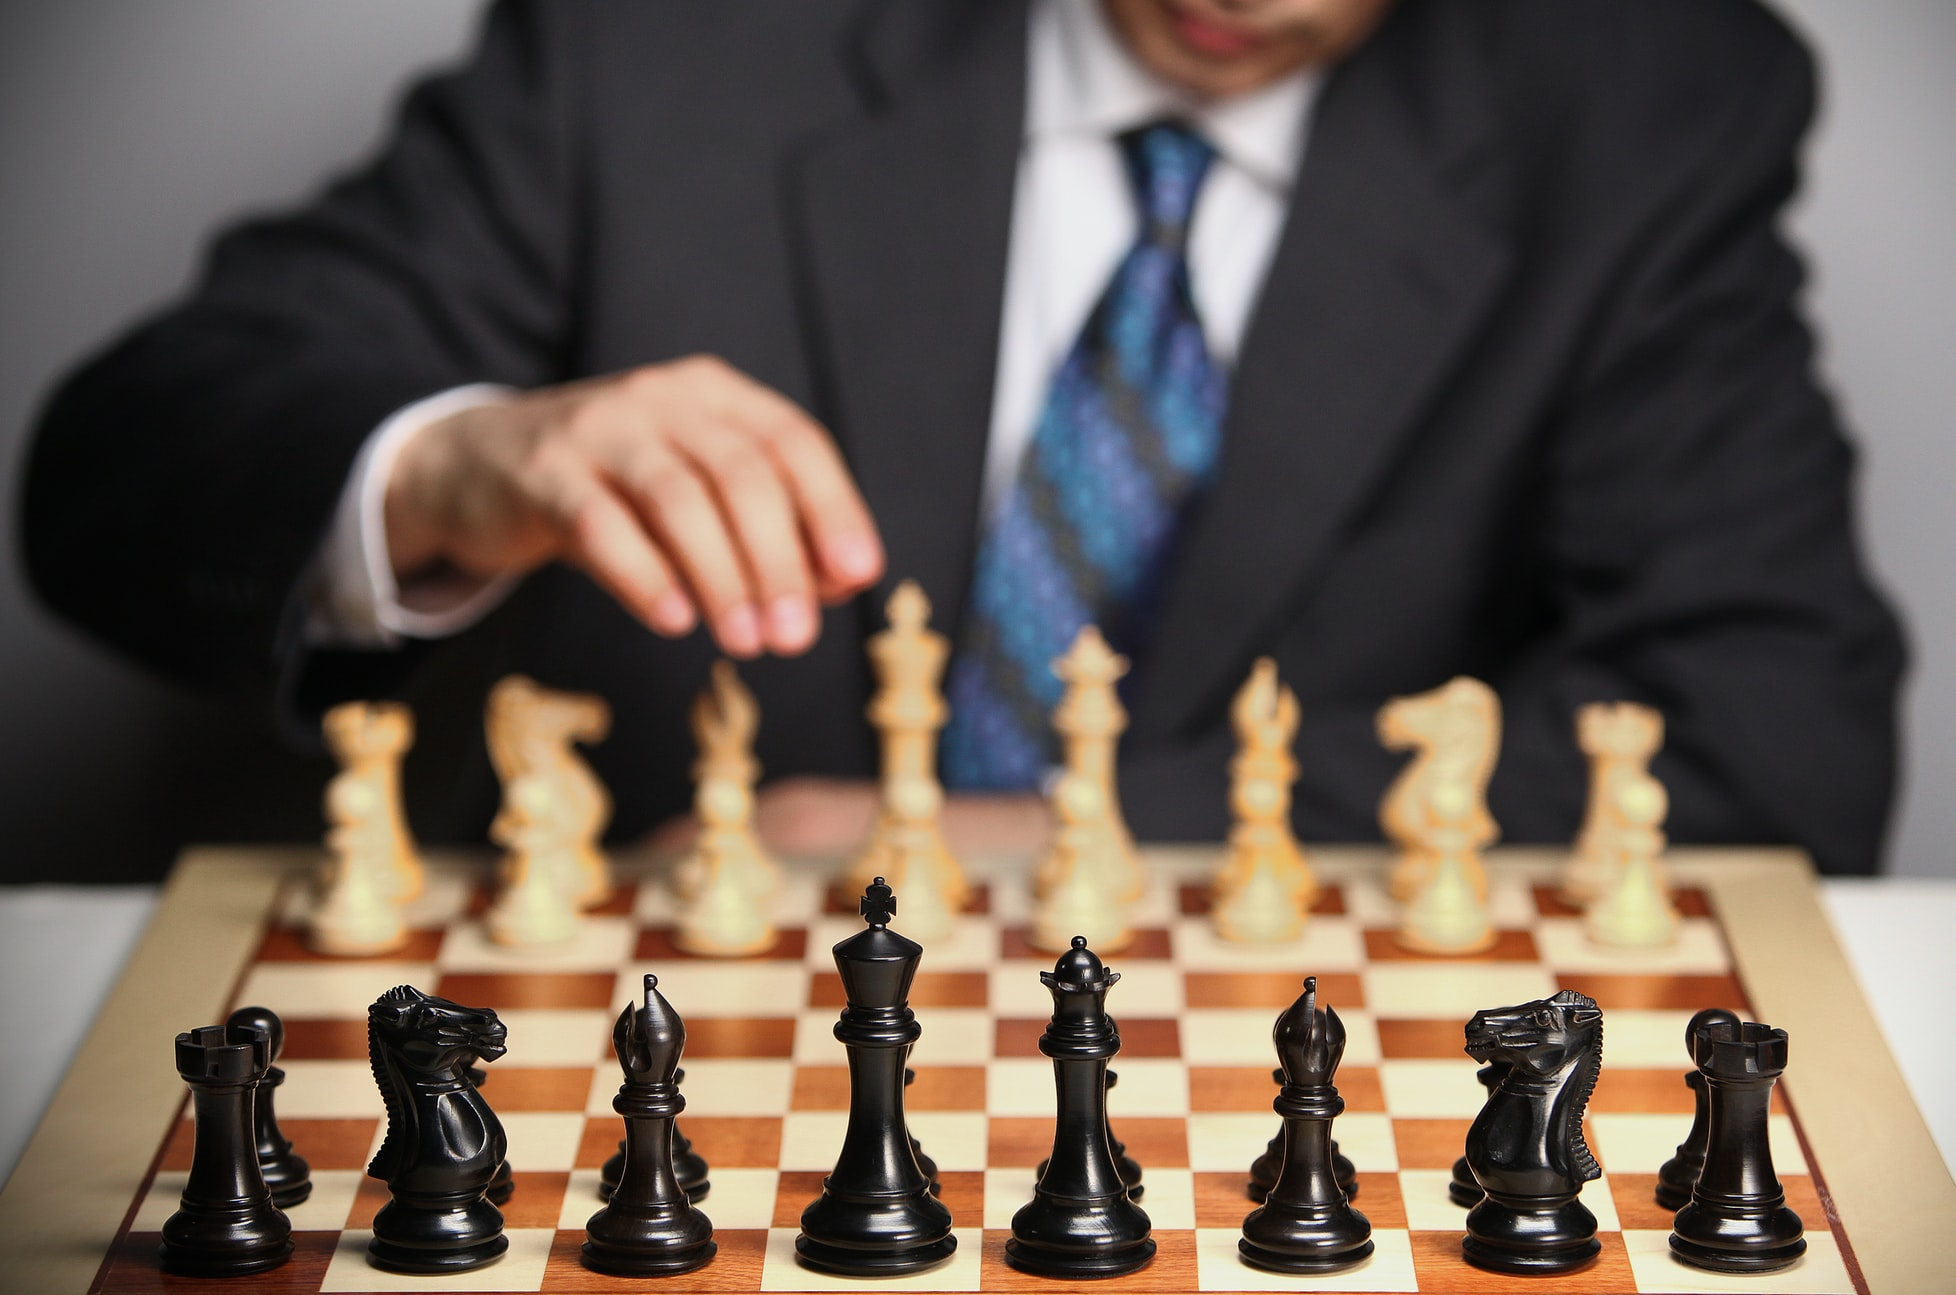 investmentstrategies-realestateinvestment-taxdeferral-taxstrategies